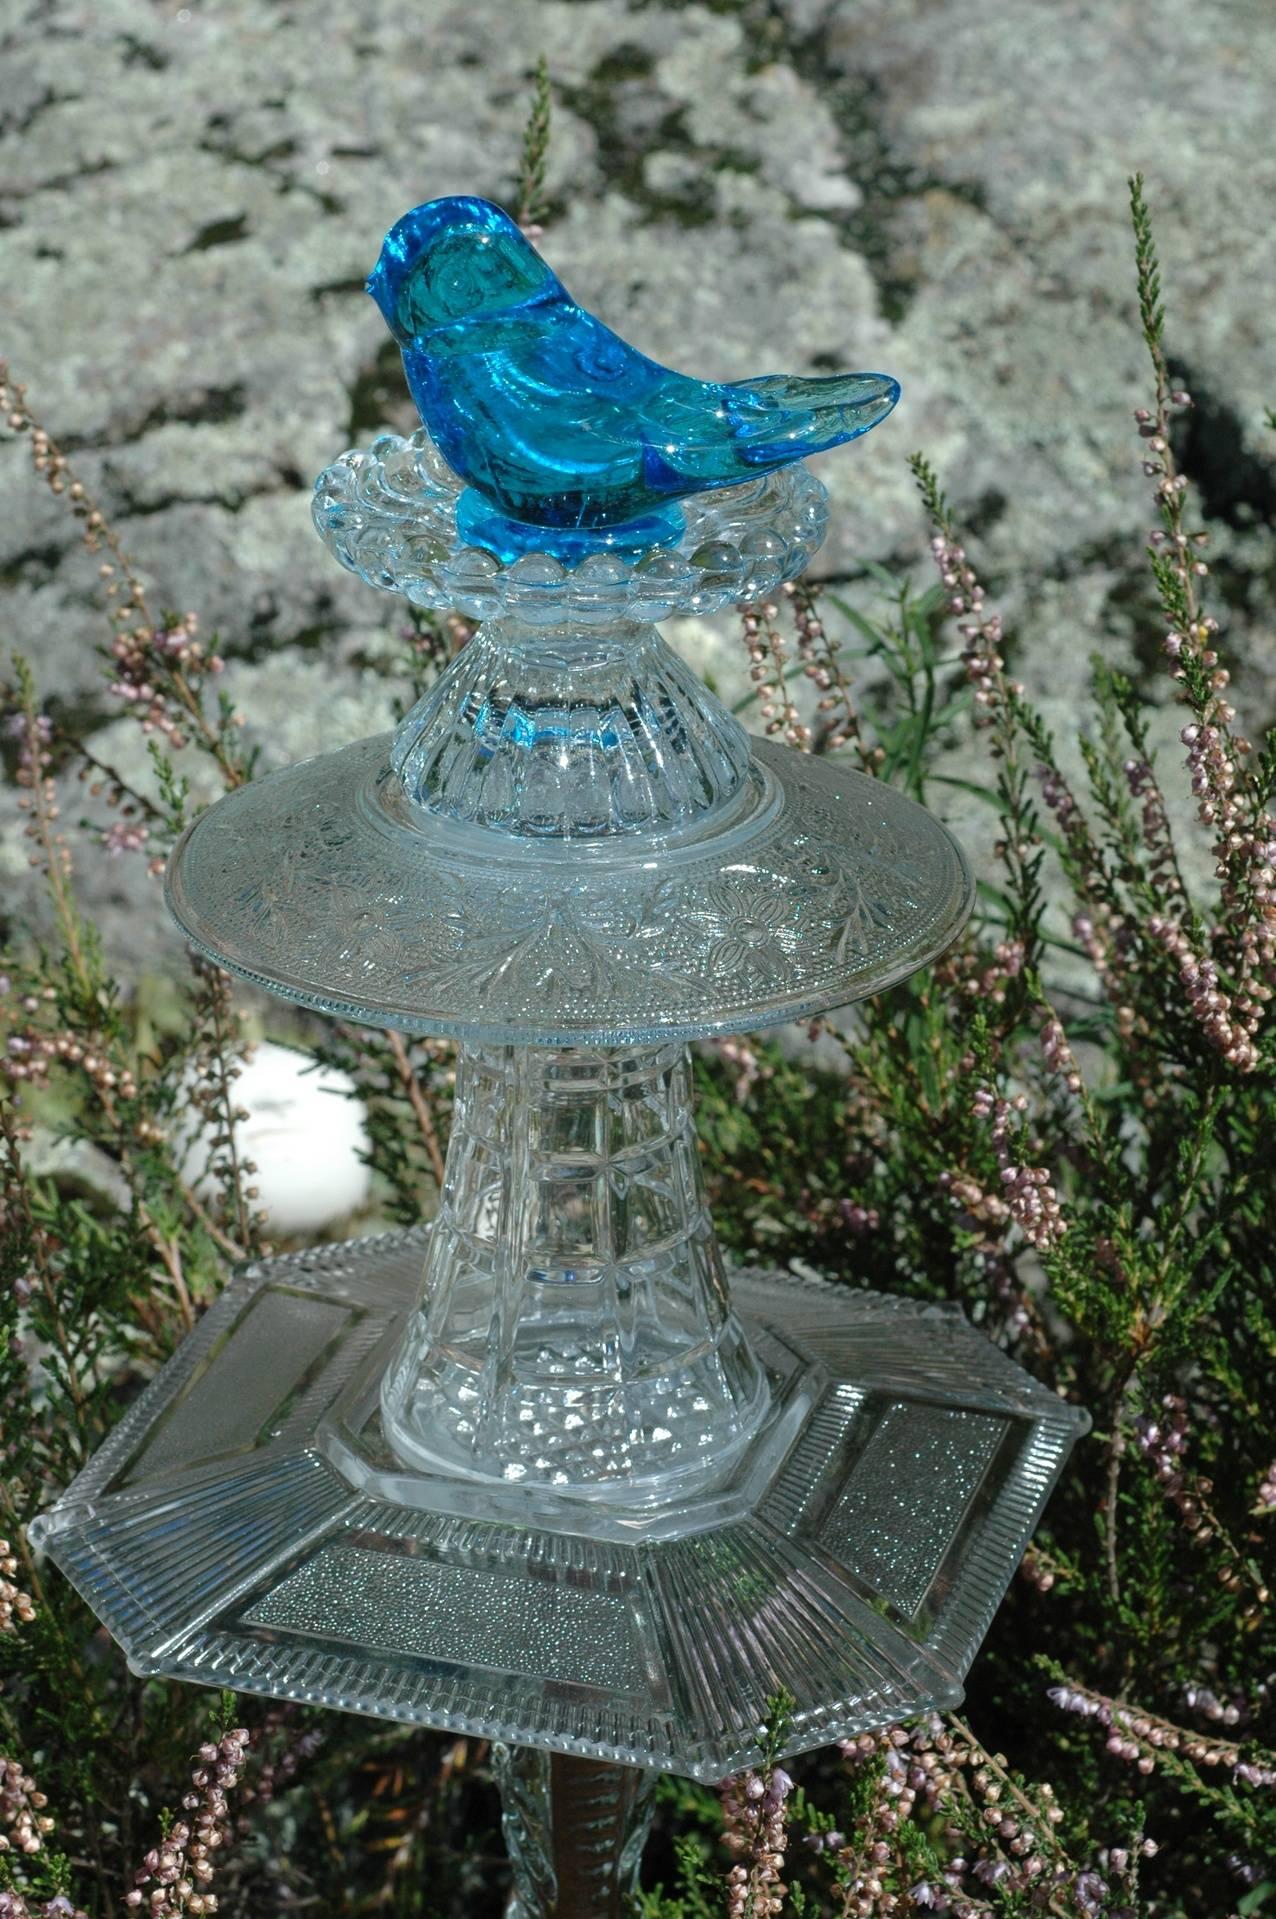 #166 - I Hear the Blue Bird Sing - SOLD